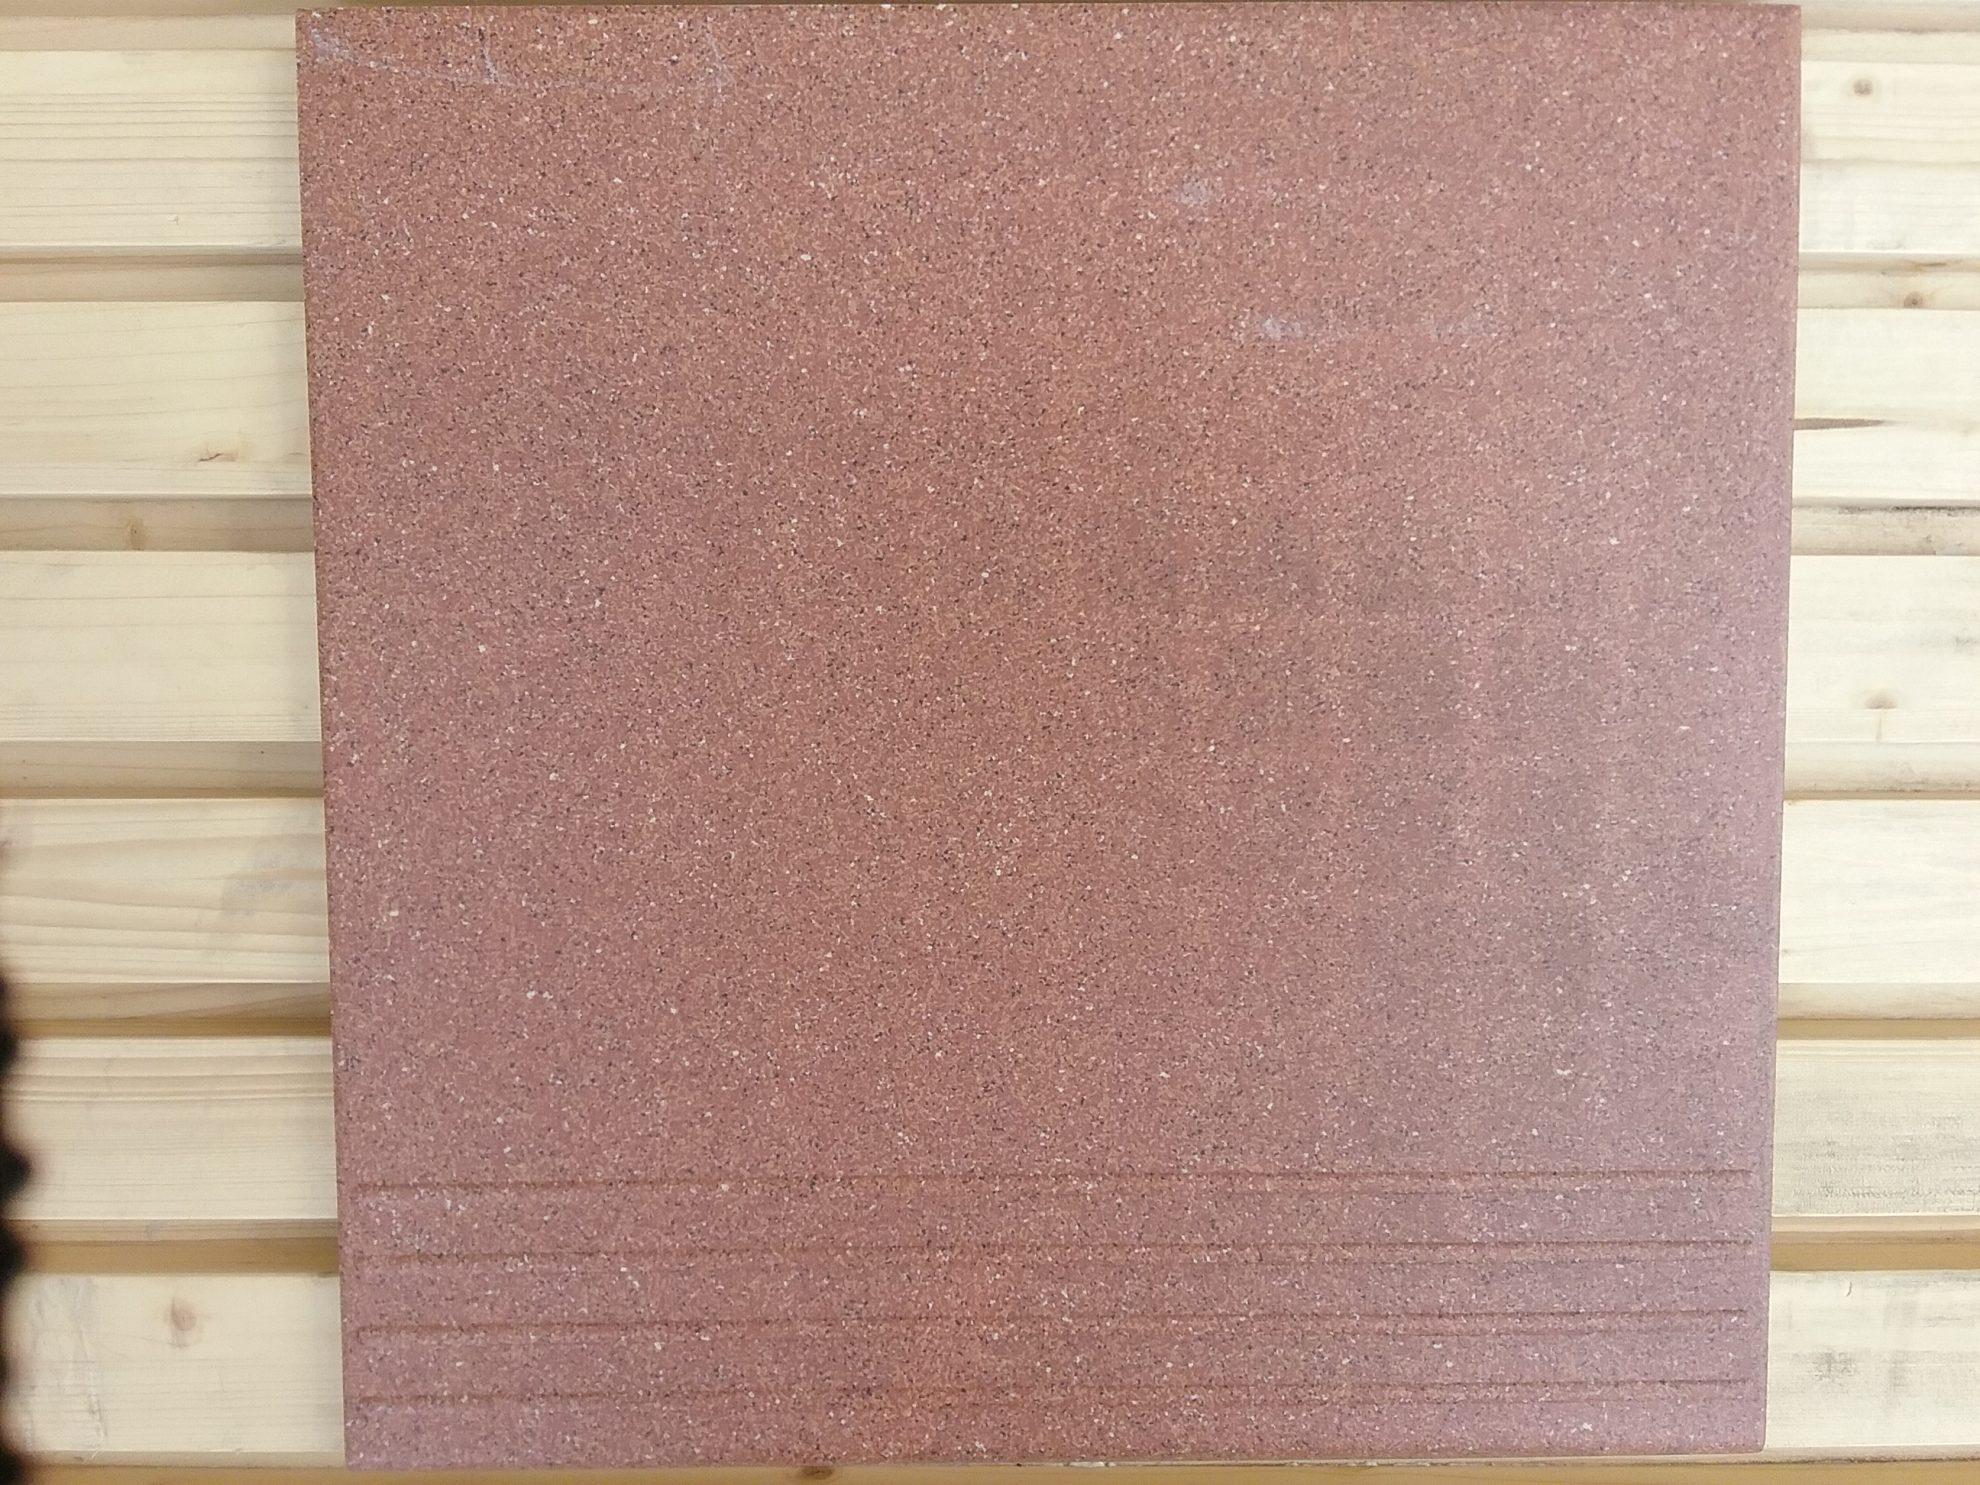 Pakopa Gradino Siena 30×30